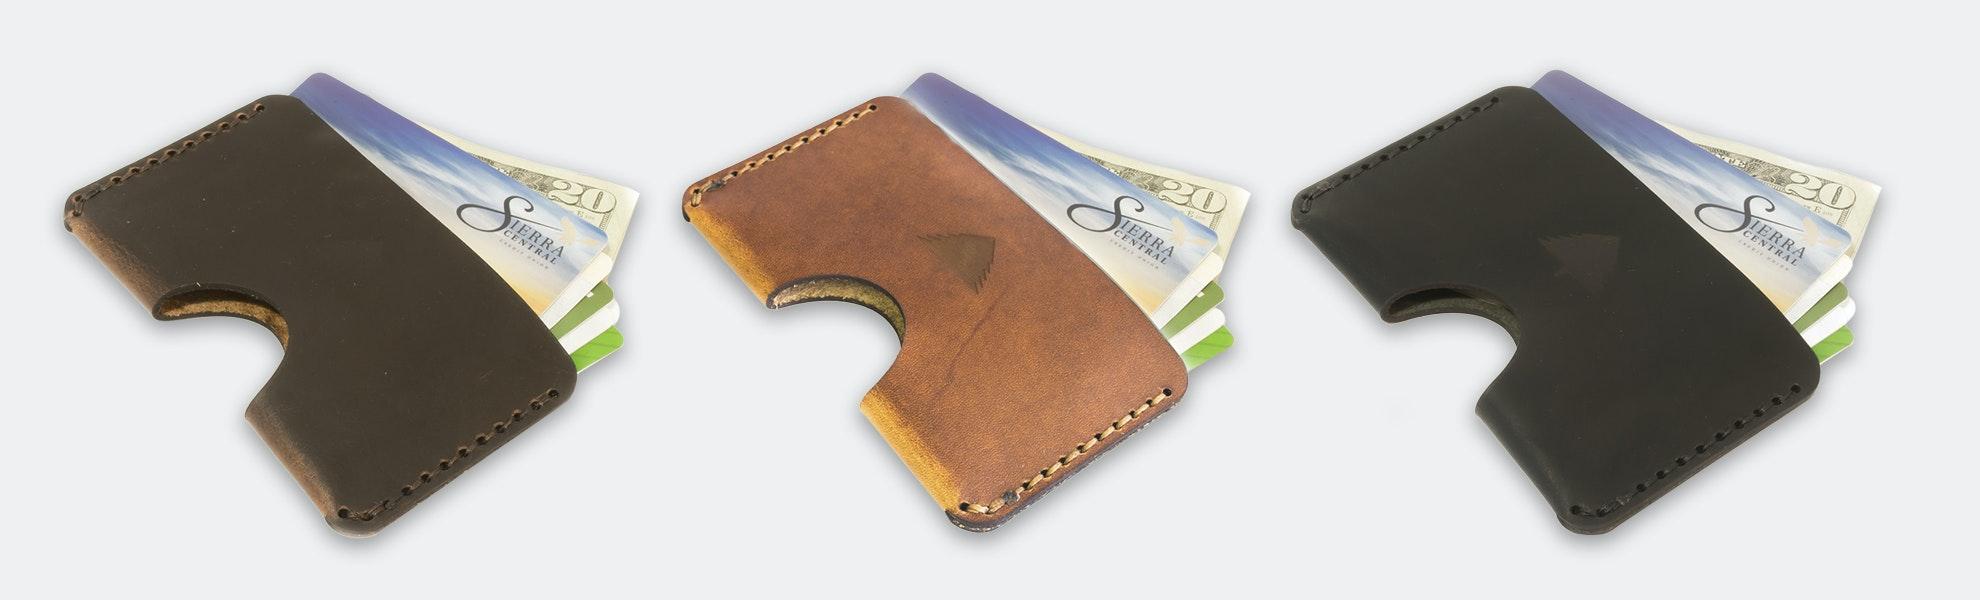 Pine Top Horizontal & Vertical Card Wallets